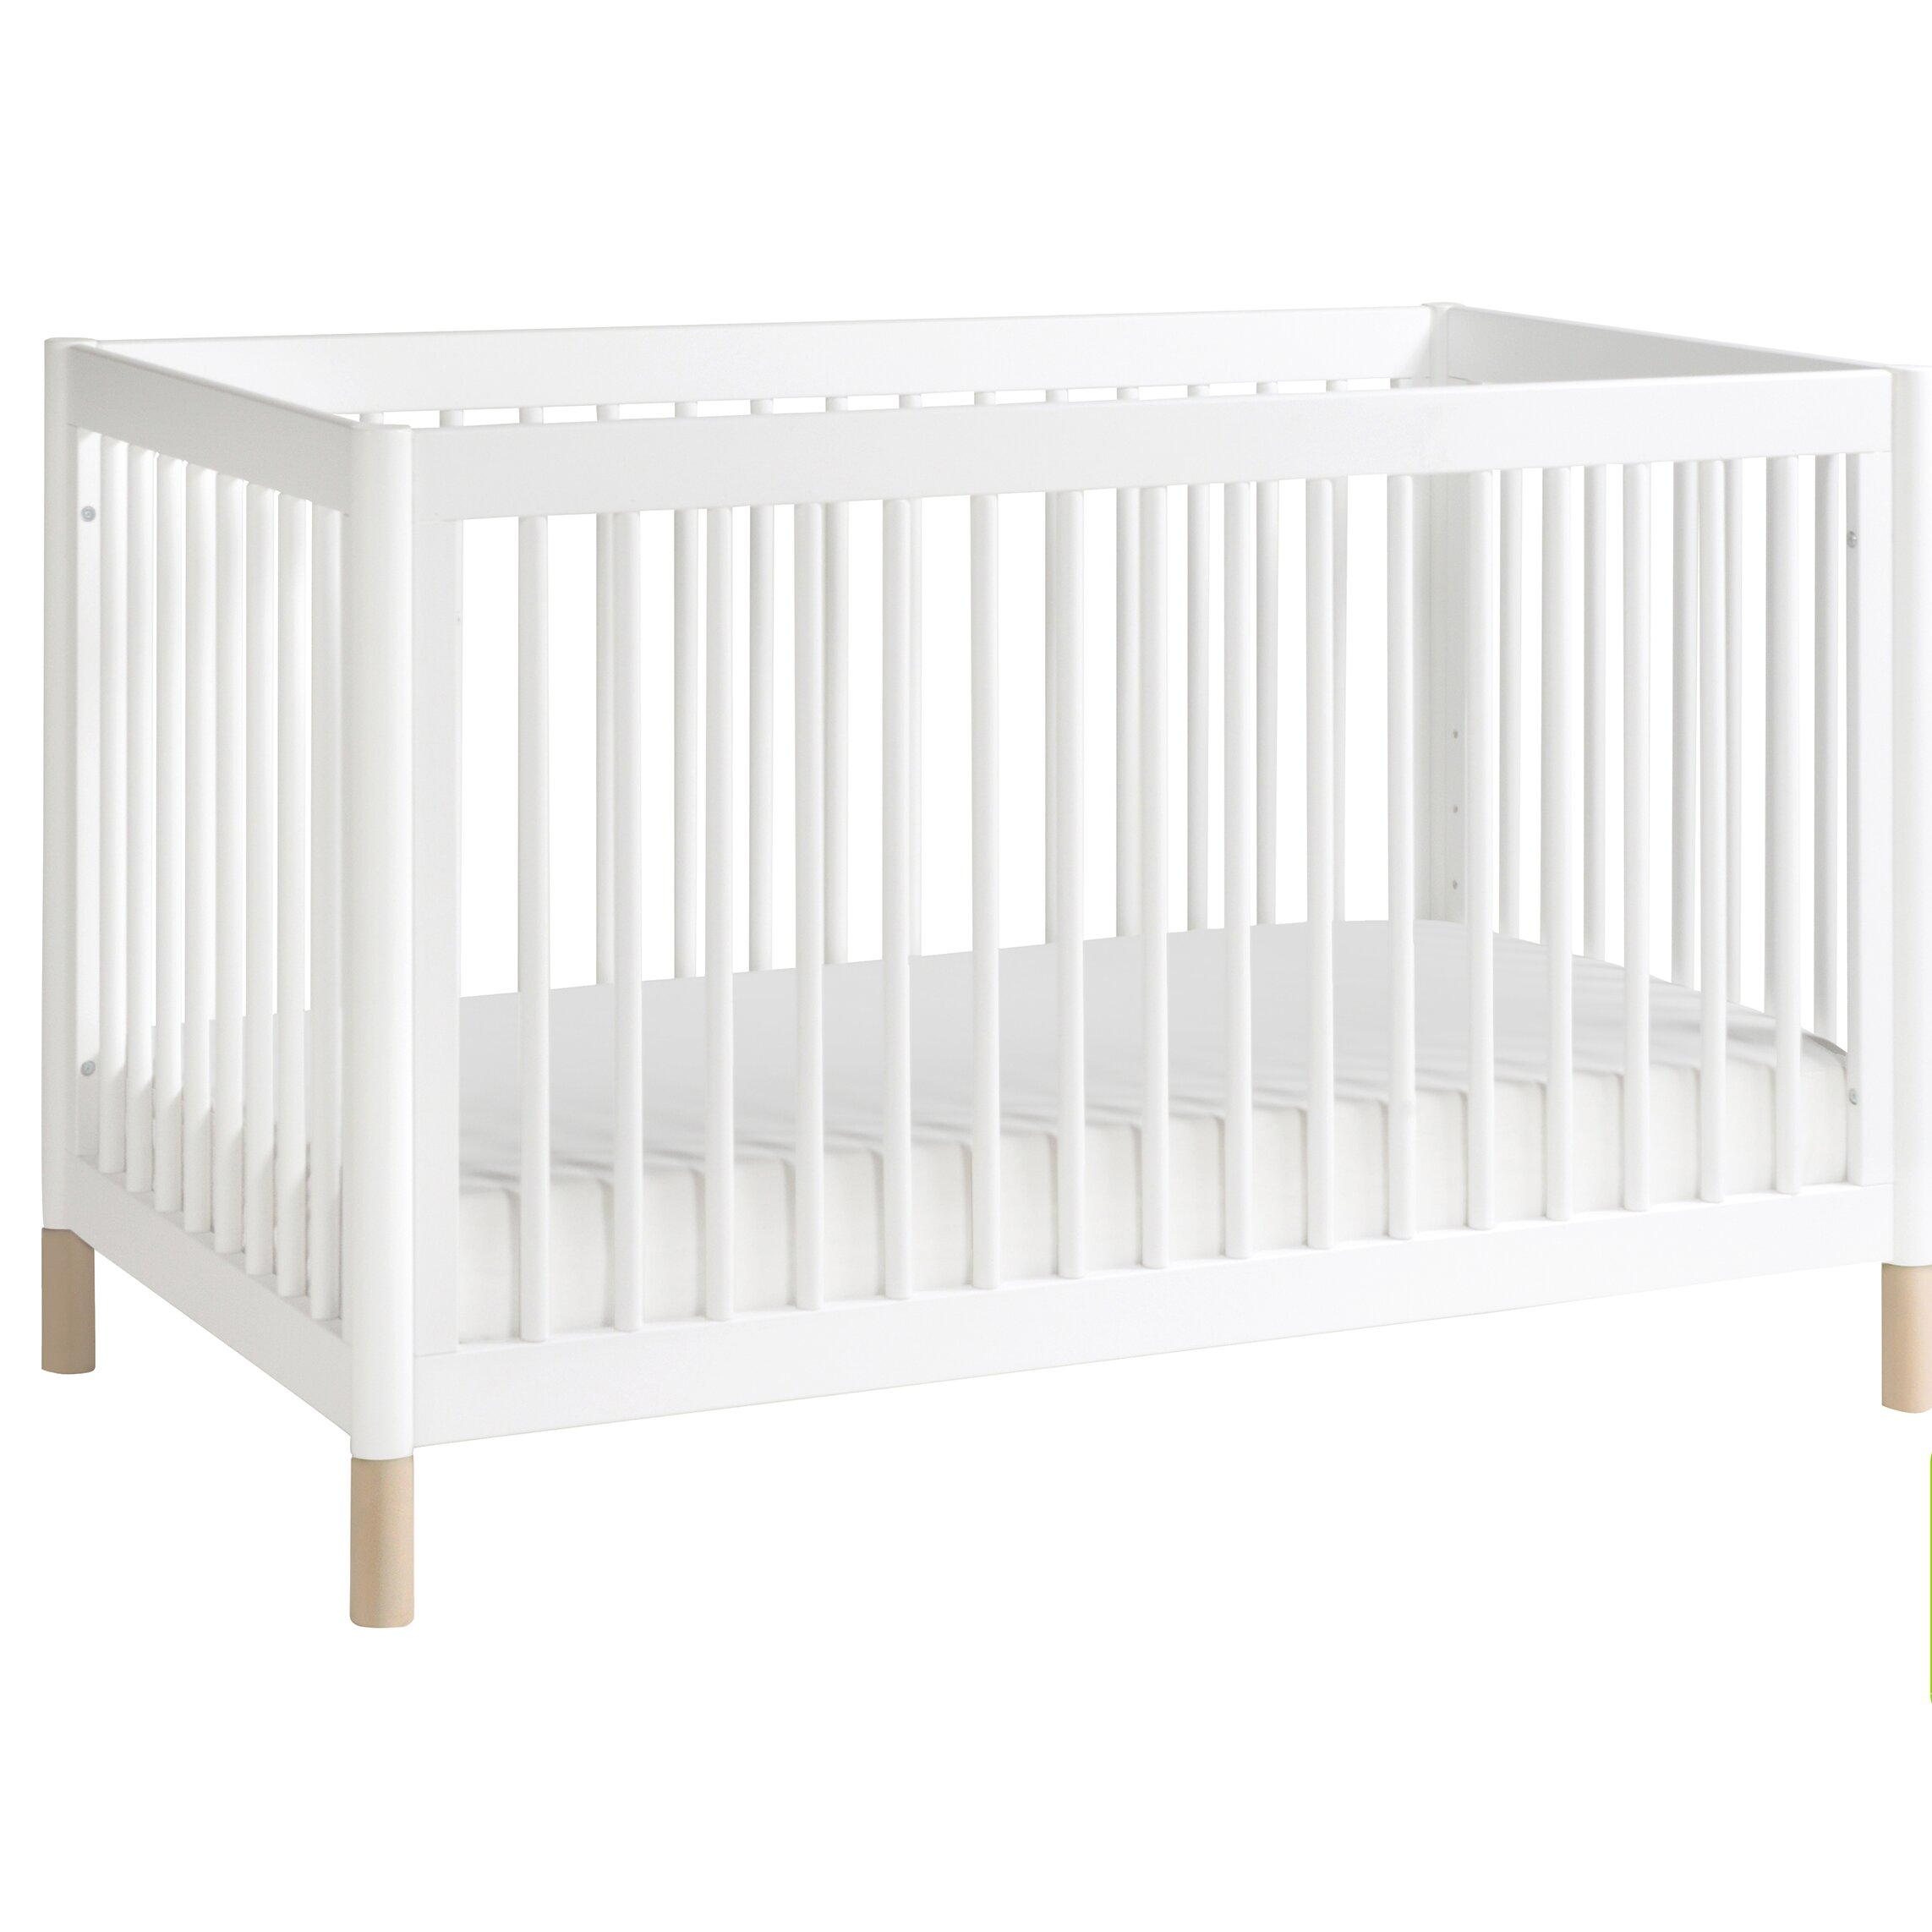 Emma iron crib for sale - Emma Iron Crib For Sale 48